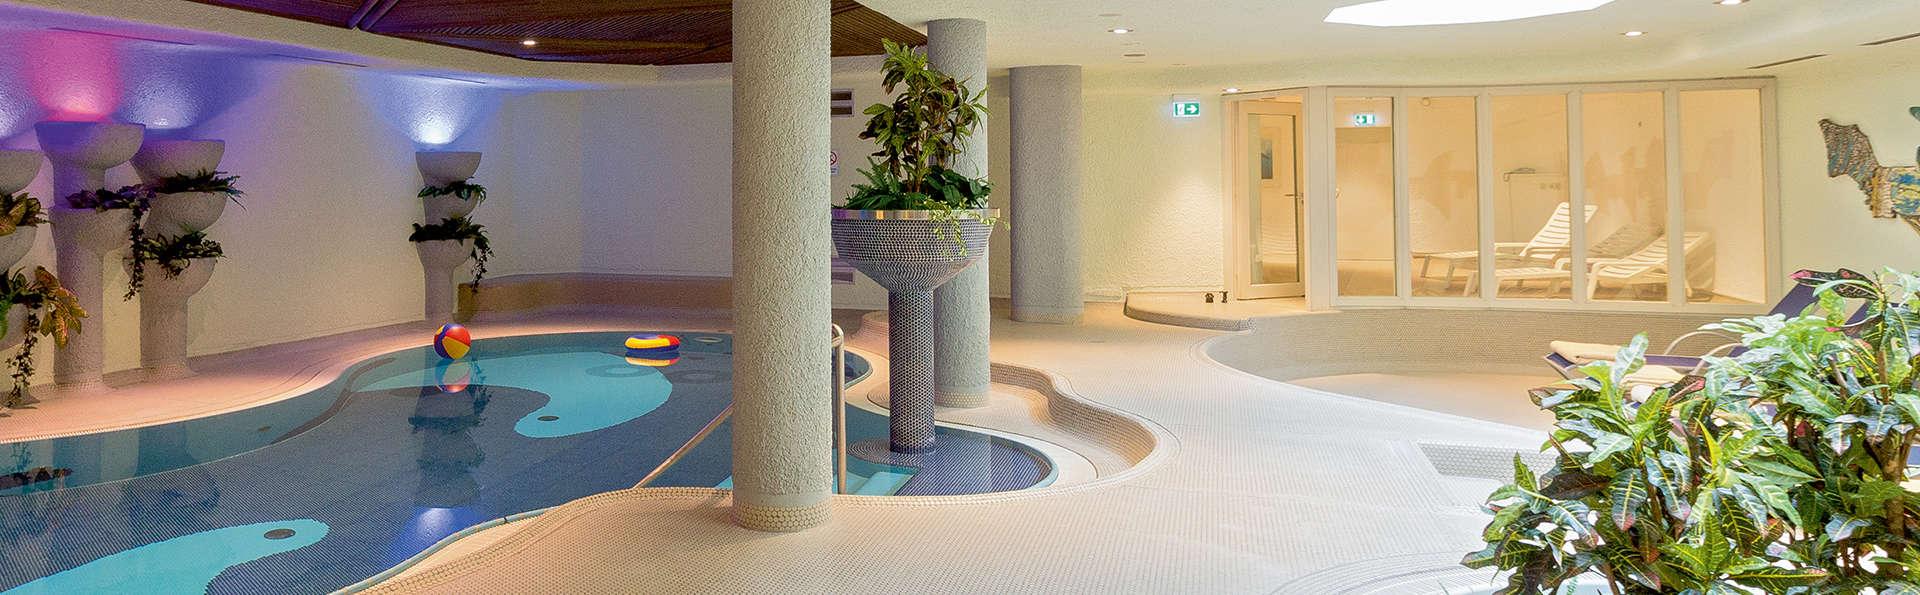 Seminaris Hotel Bad Honnef - Edit_Wellness.jpg